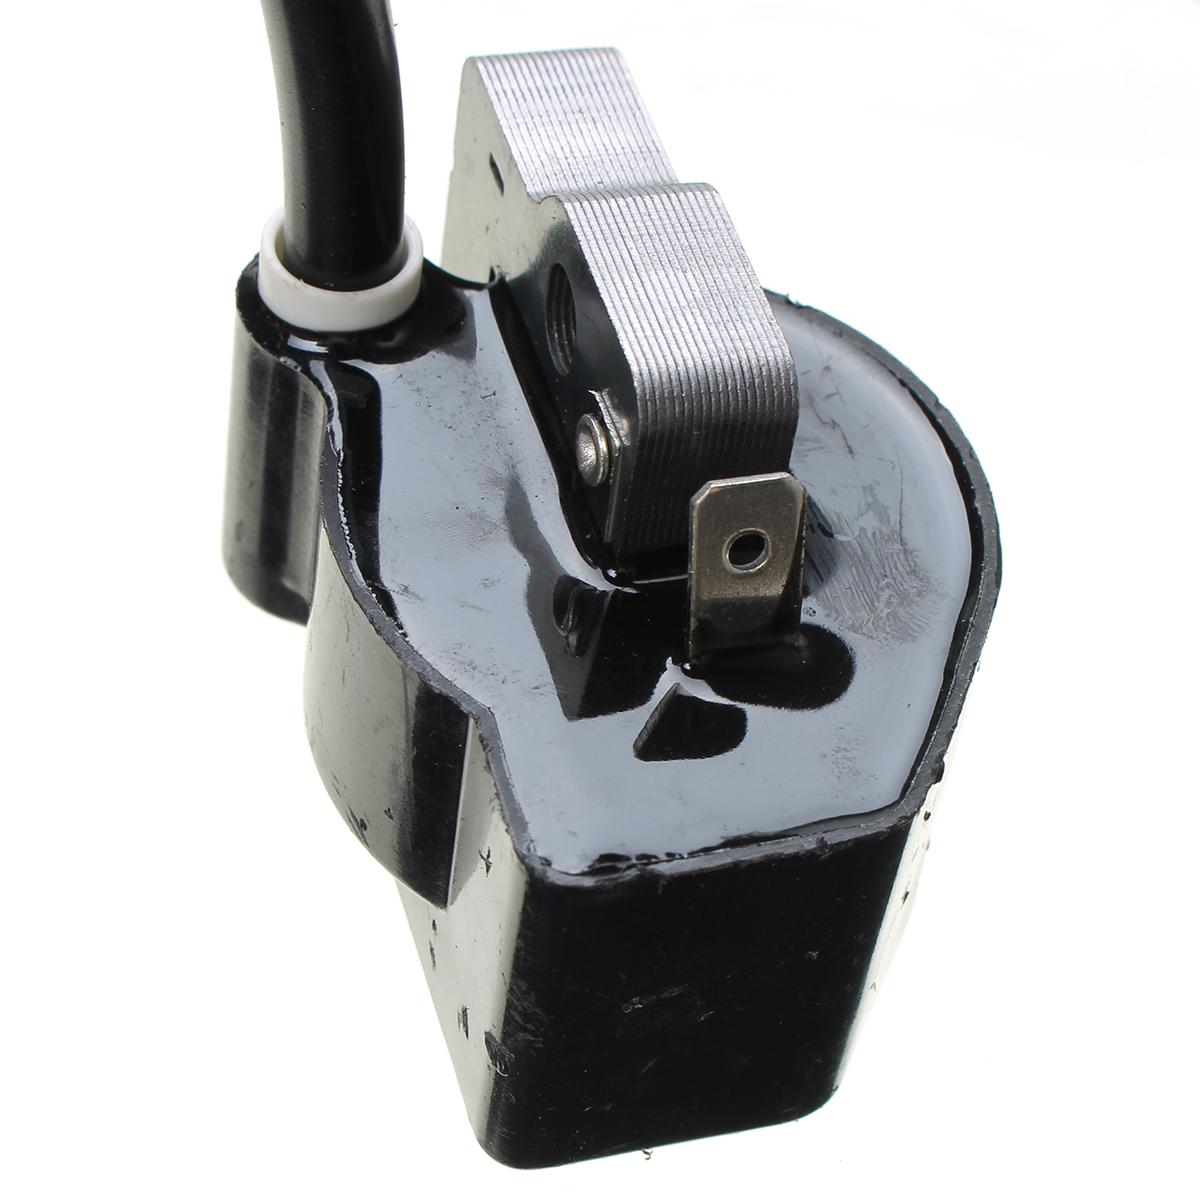 Viviance ZHVIVY Ignition coil for RYOBI 30cc petrol strimmer BLOW N VACS ETC